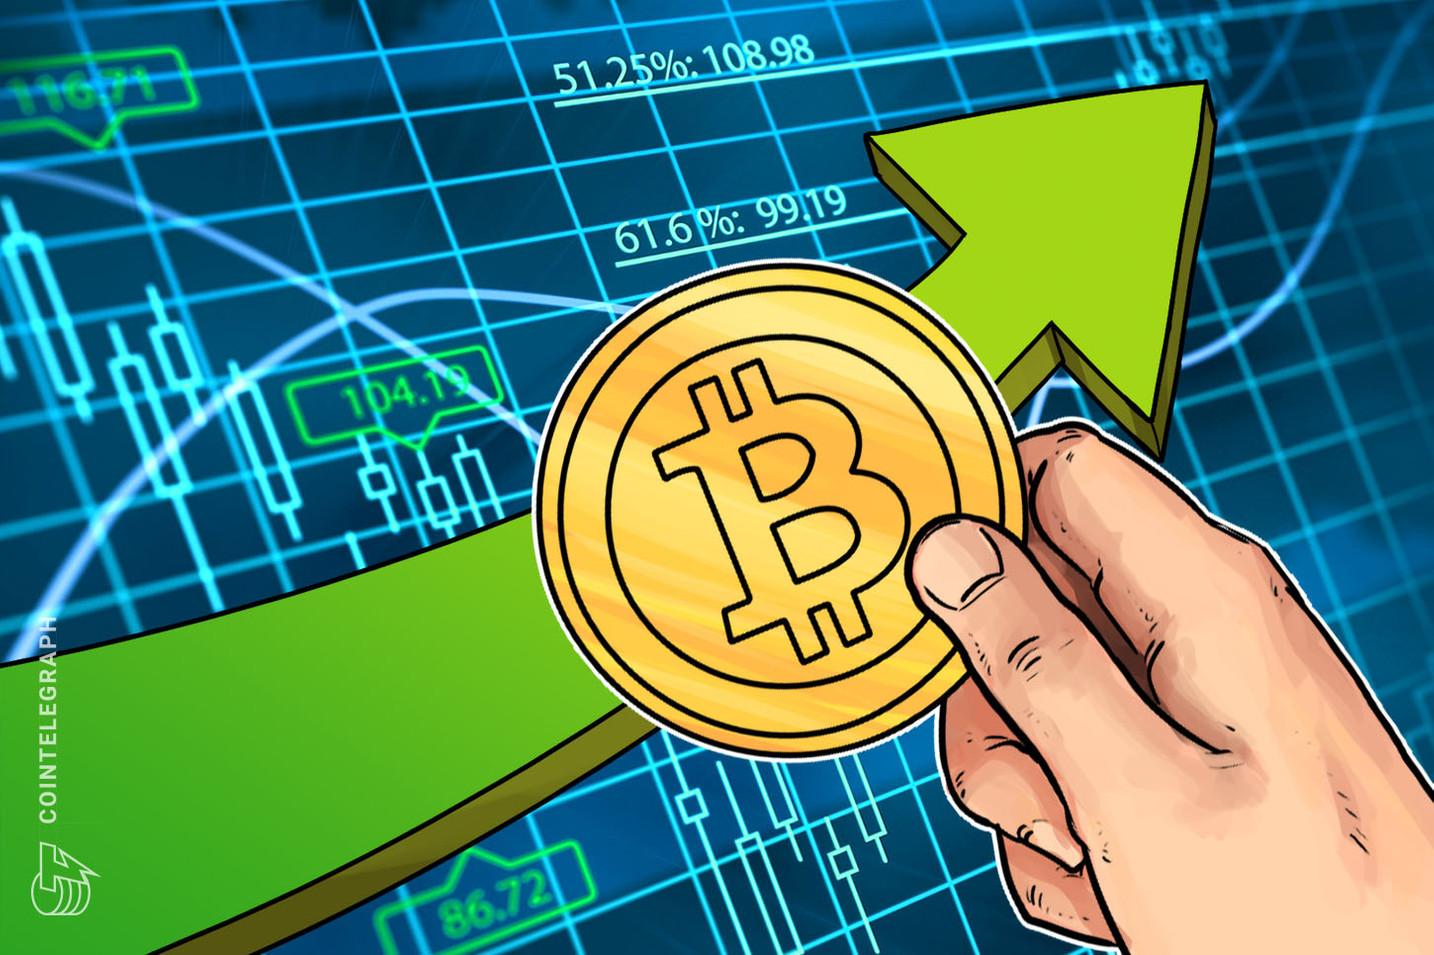 Mercados de criptomonedas experimentan una ola generalizada de verde, Bitcoin empuja a $6 500